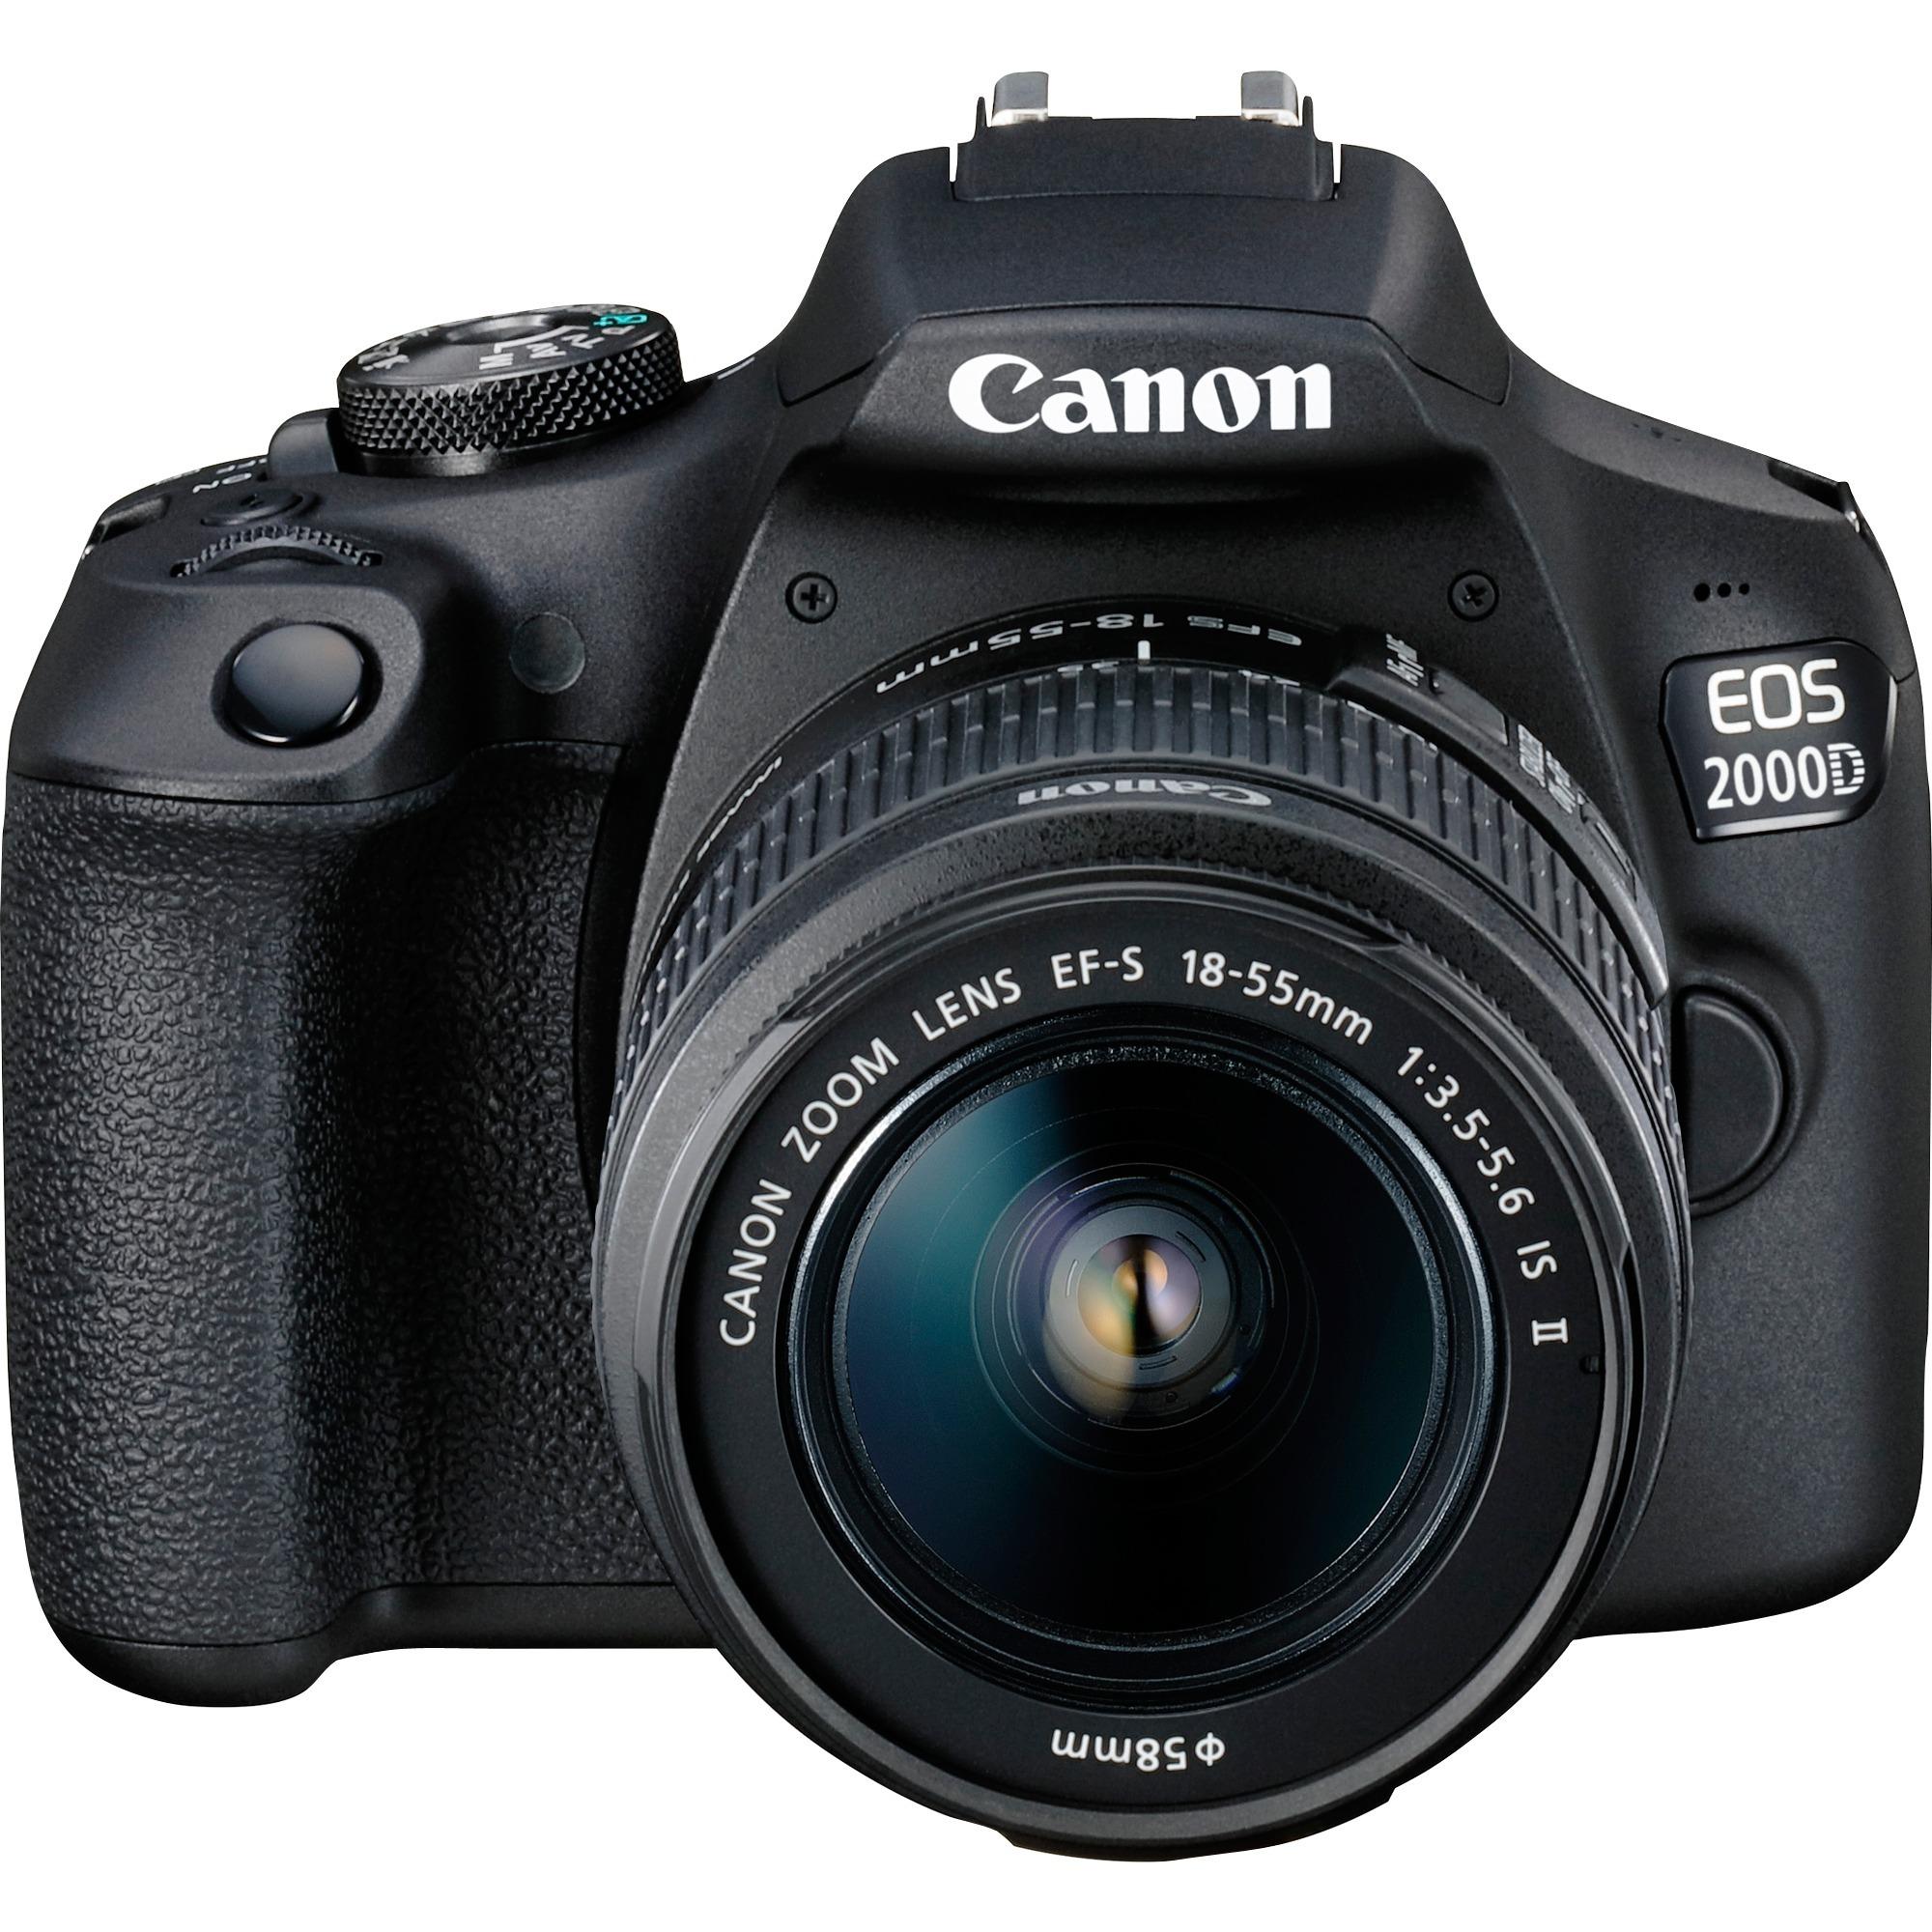 EOS 2000D BK 18-55 IS II EU26 Juego de cámara SLR 24,1 MP CMOS 6000 x 4000 Pixeles Negro, Cámara digital